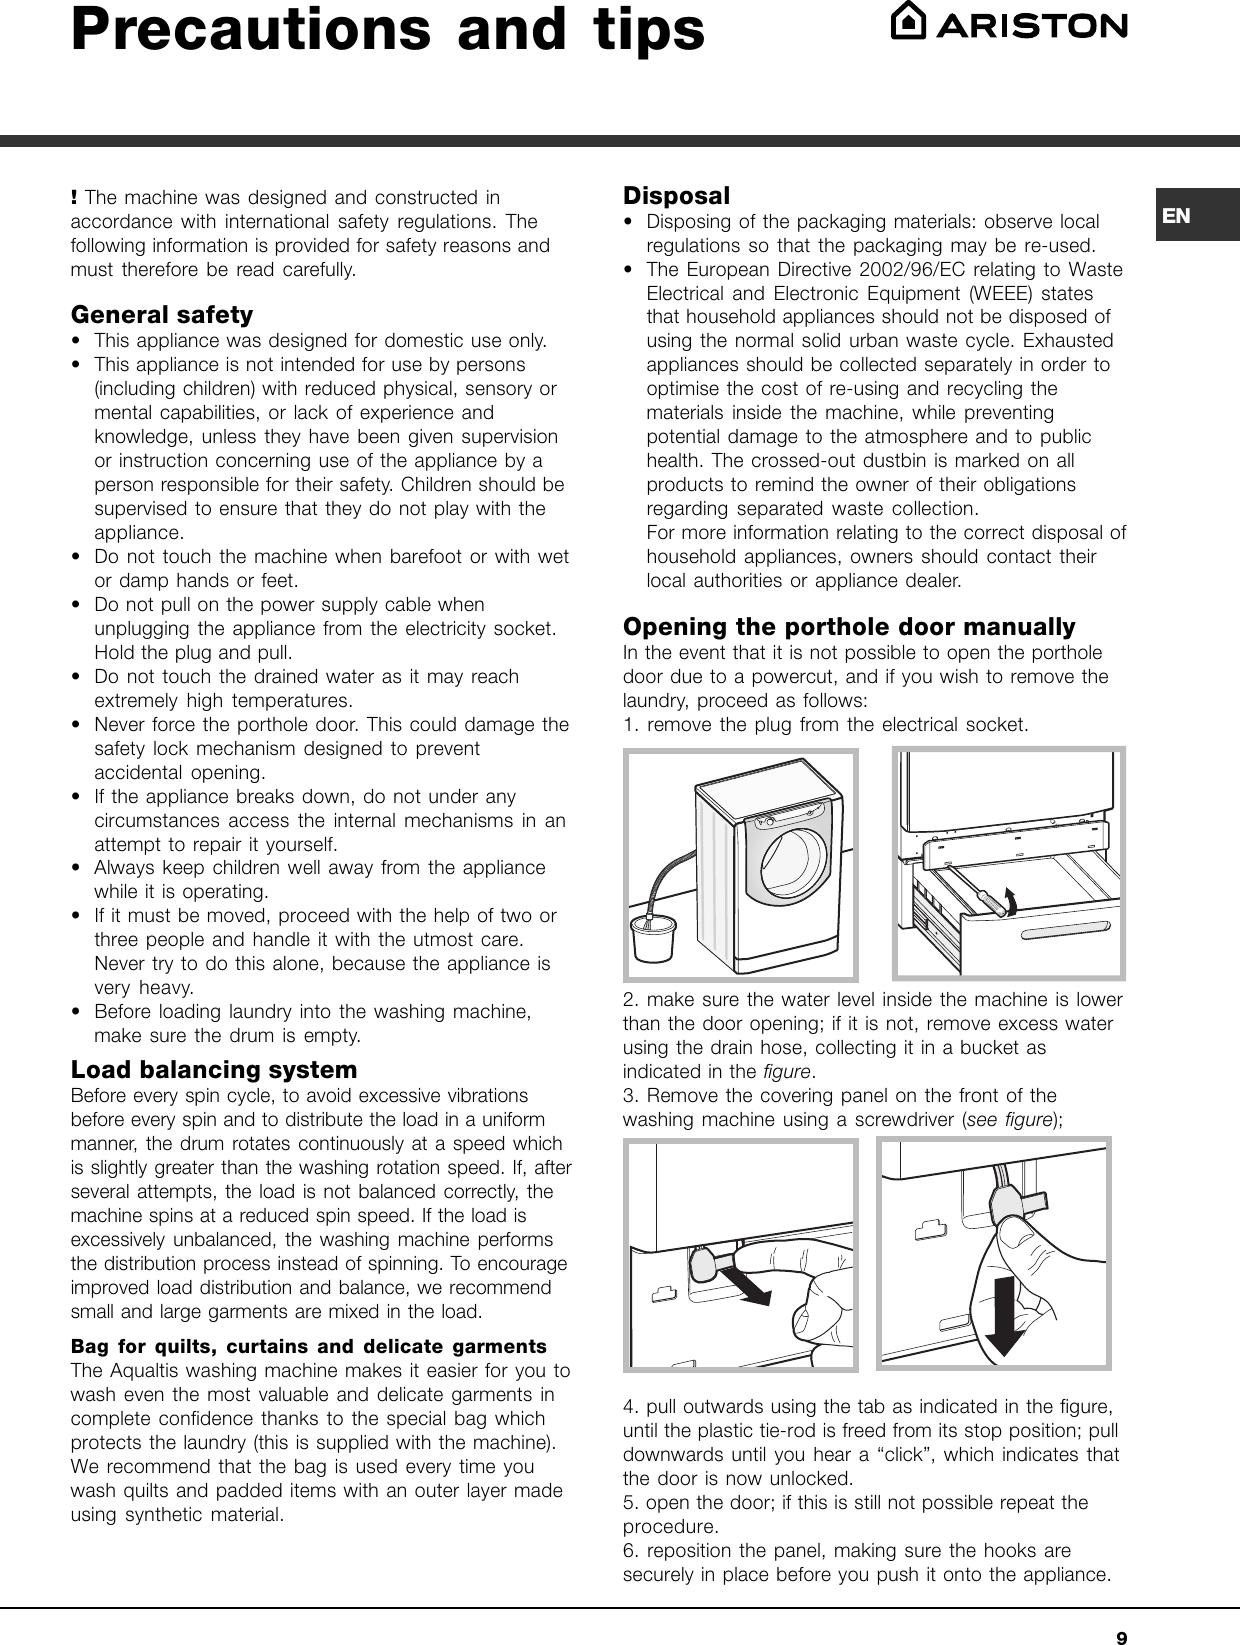 Ariston Washing Machine Aq9d 49 U H Users Manual Aqualtis Digit 2008 Gb Wiring Diagram Page 9 Of 12